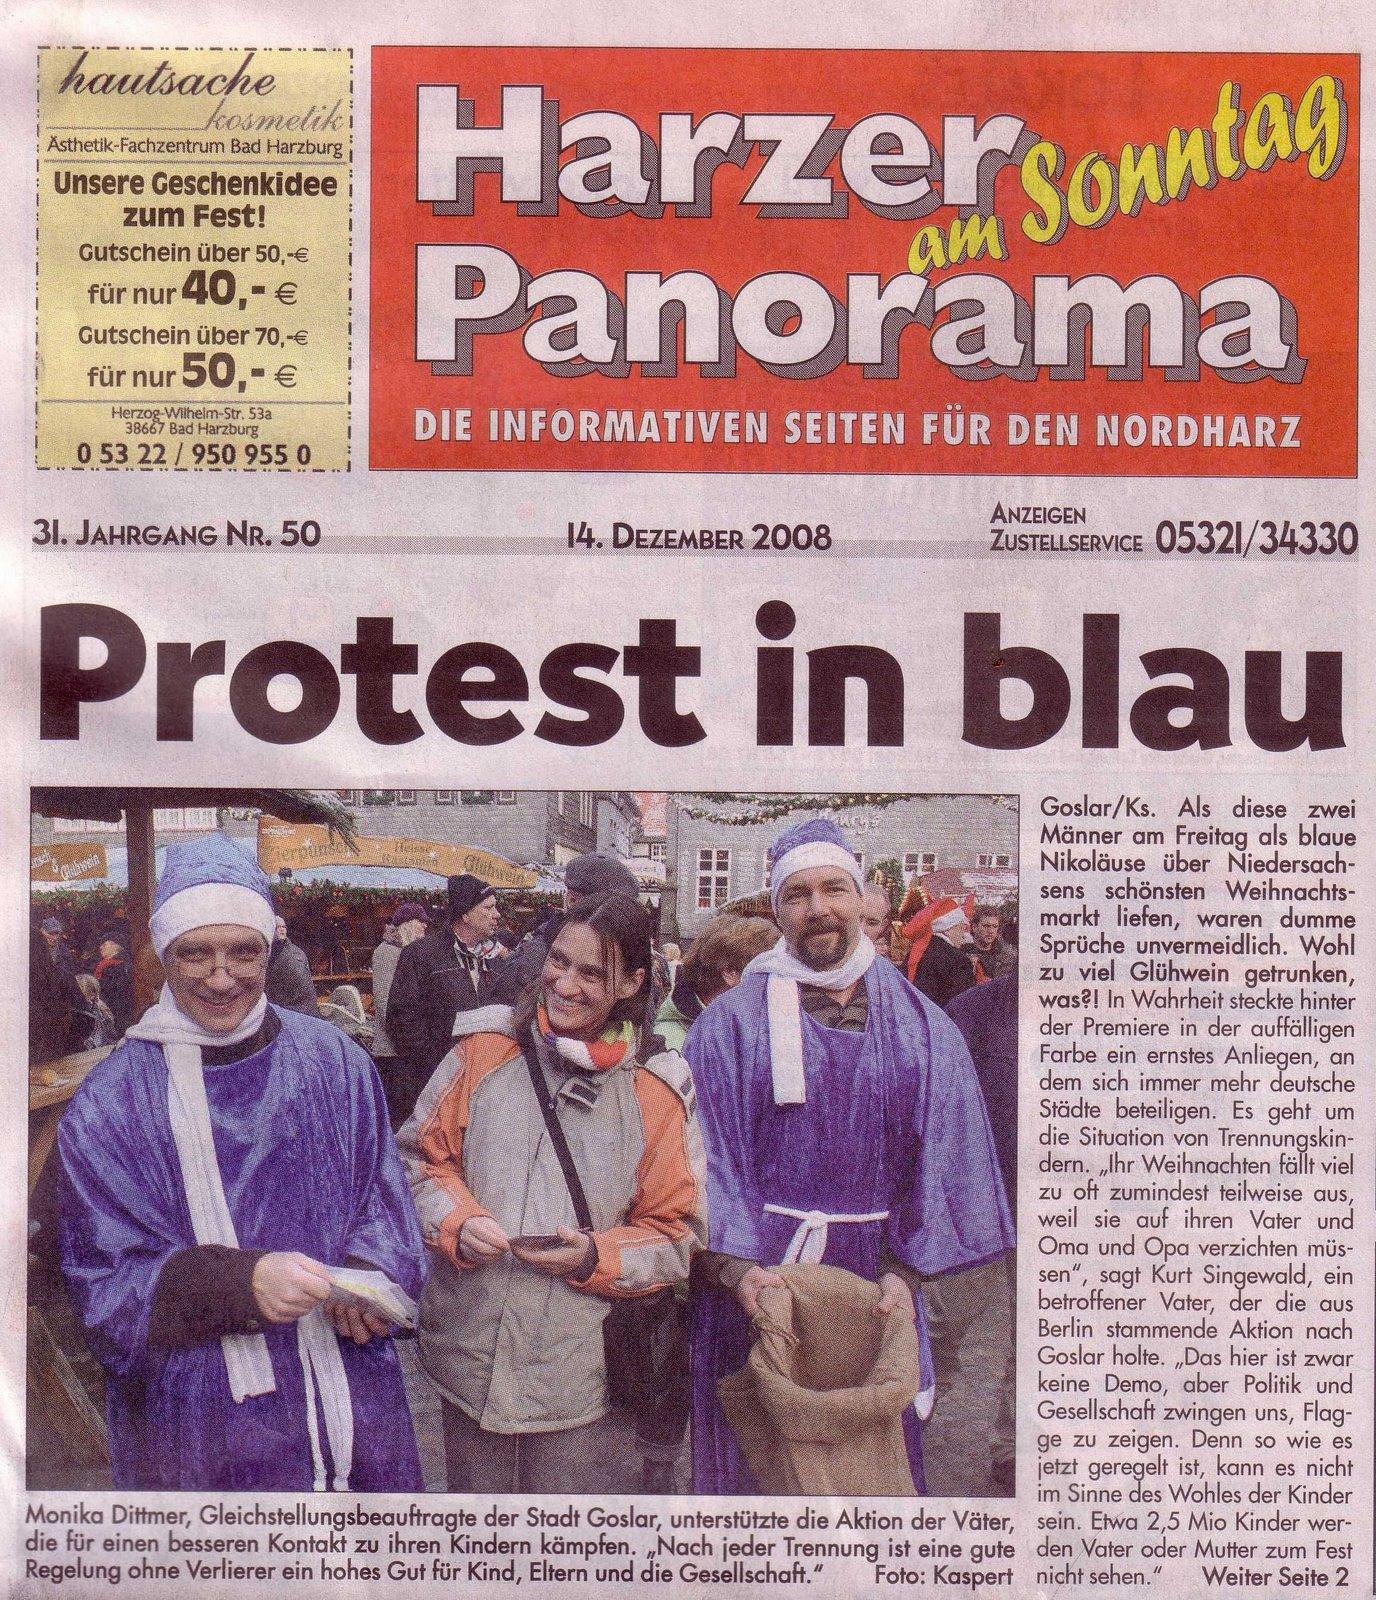 [1412-goslar-Protest-in-blau-m44668d208.jpg]